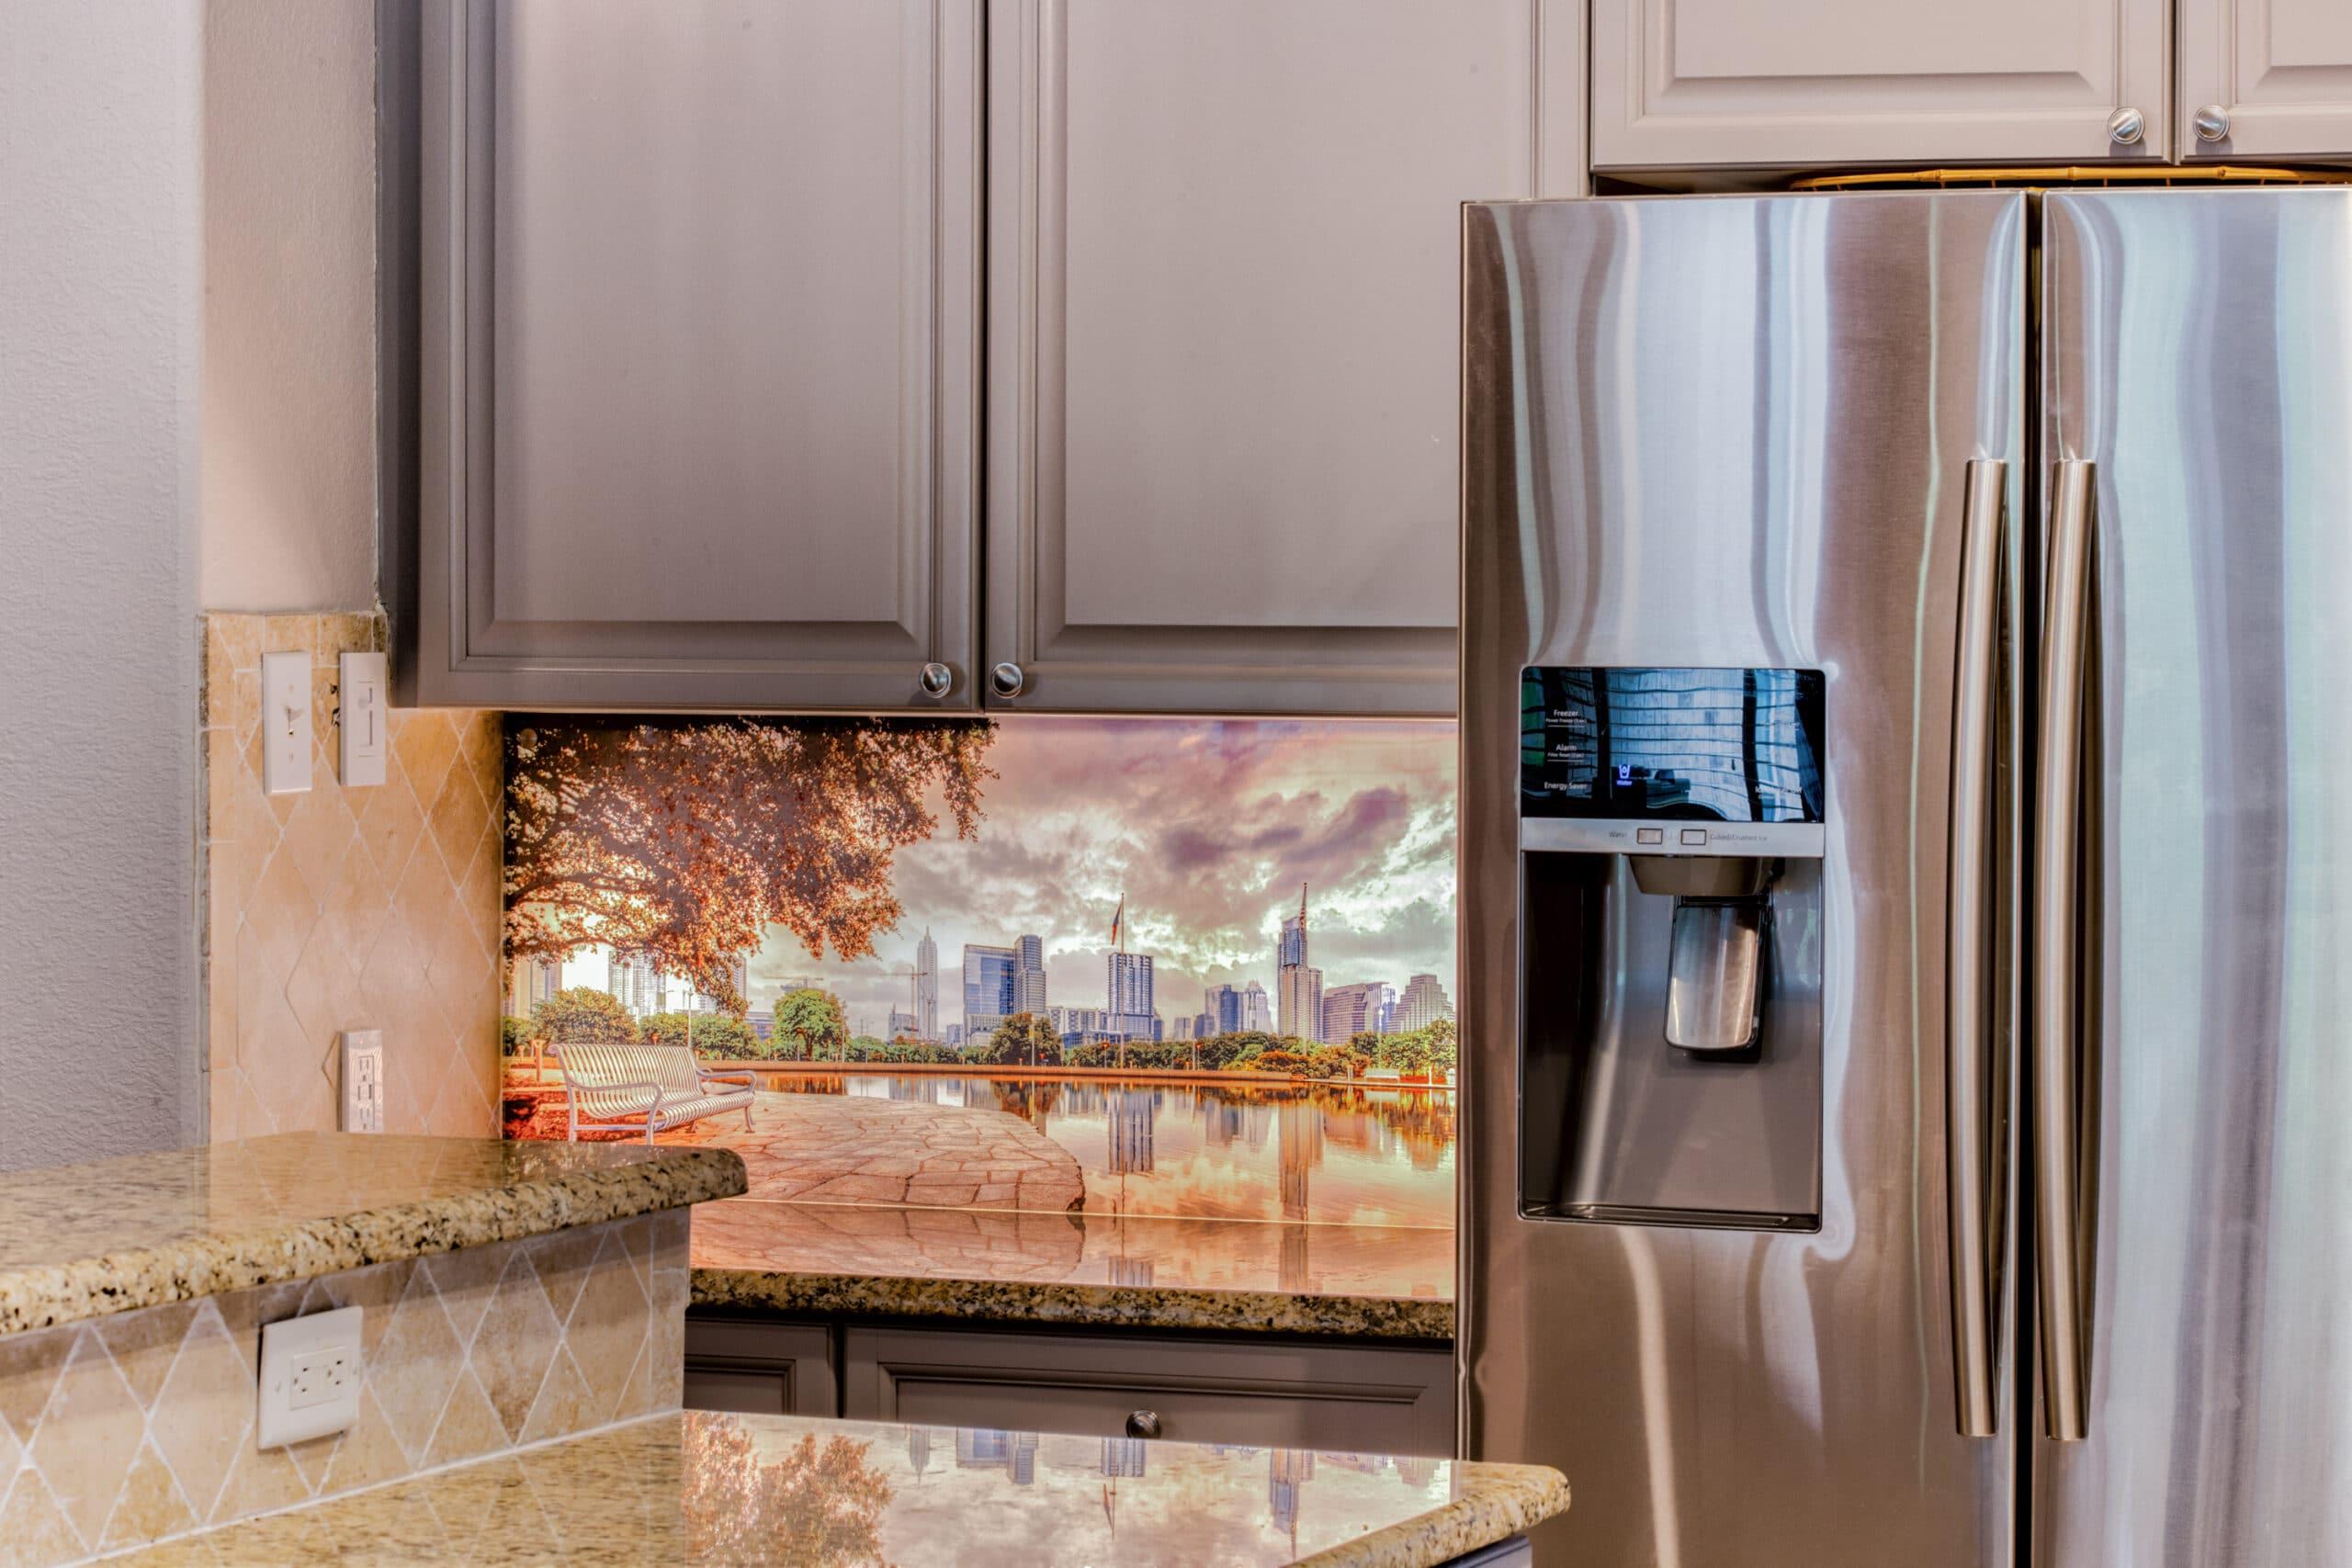 Professional Photography Solutions Digital Glass Backsplash of Austin Texas Backlit